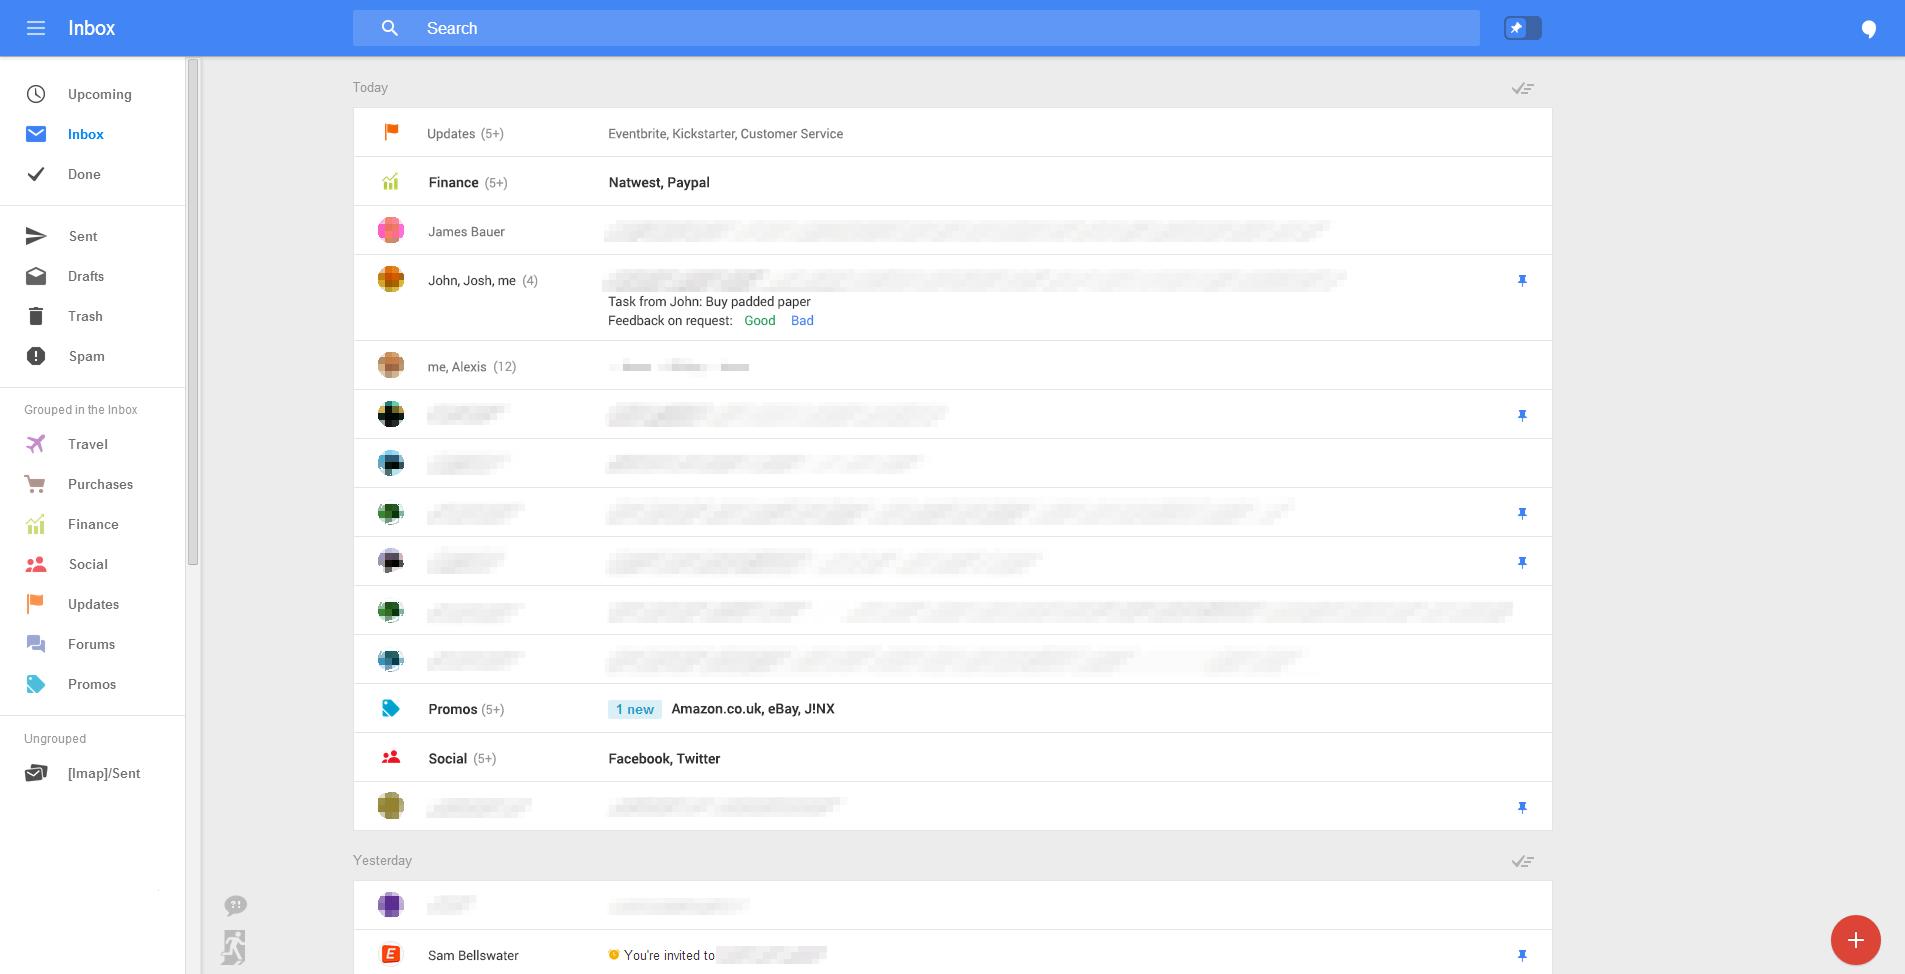 gmail new design 2014